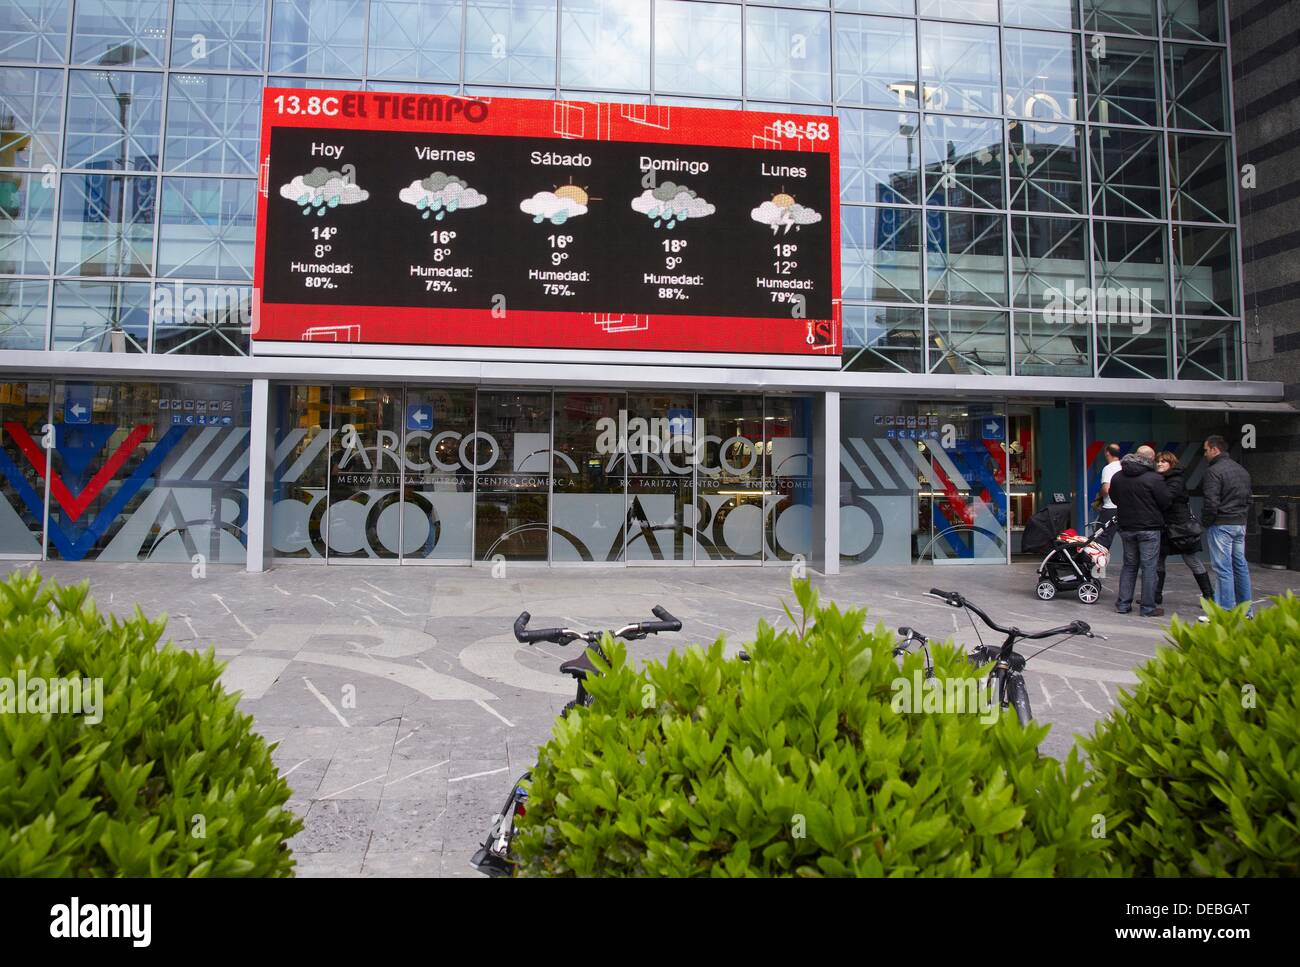 Giant LED TV screen, IPTV (Internet Protocol Television), shopping mall, San Sebastian, Guipuzcoa, Basque Country, Spain - Stock Image